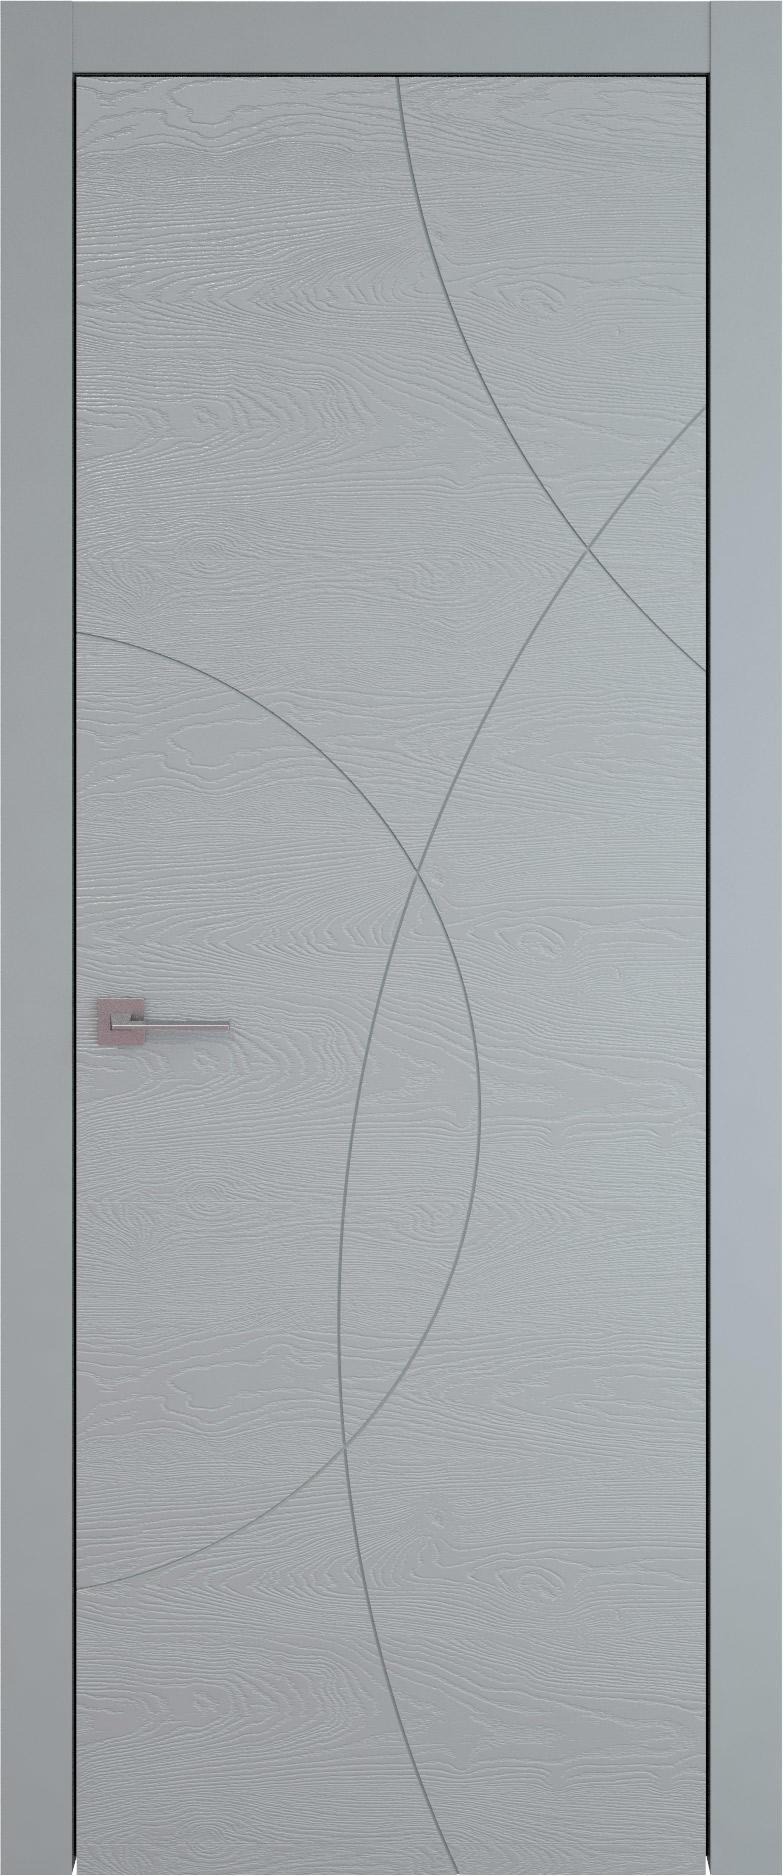 Tivoli Б-5 цвет - Серебристо-серая эмаль по шпону (RAL 7045) Без стекла (ДГ)